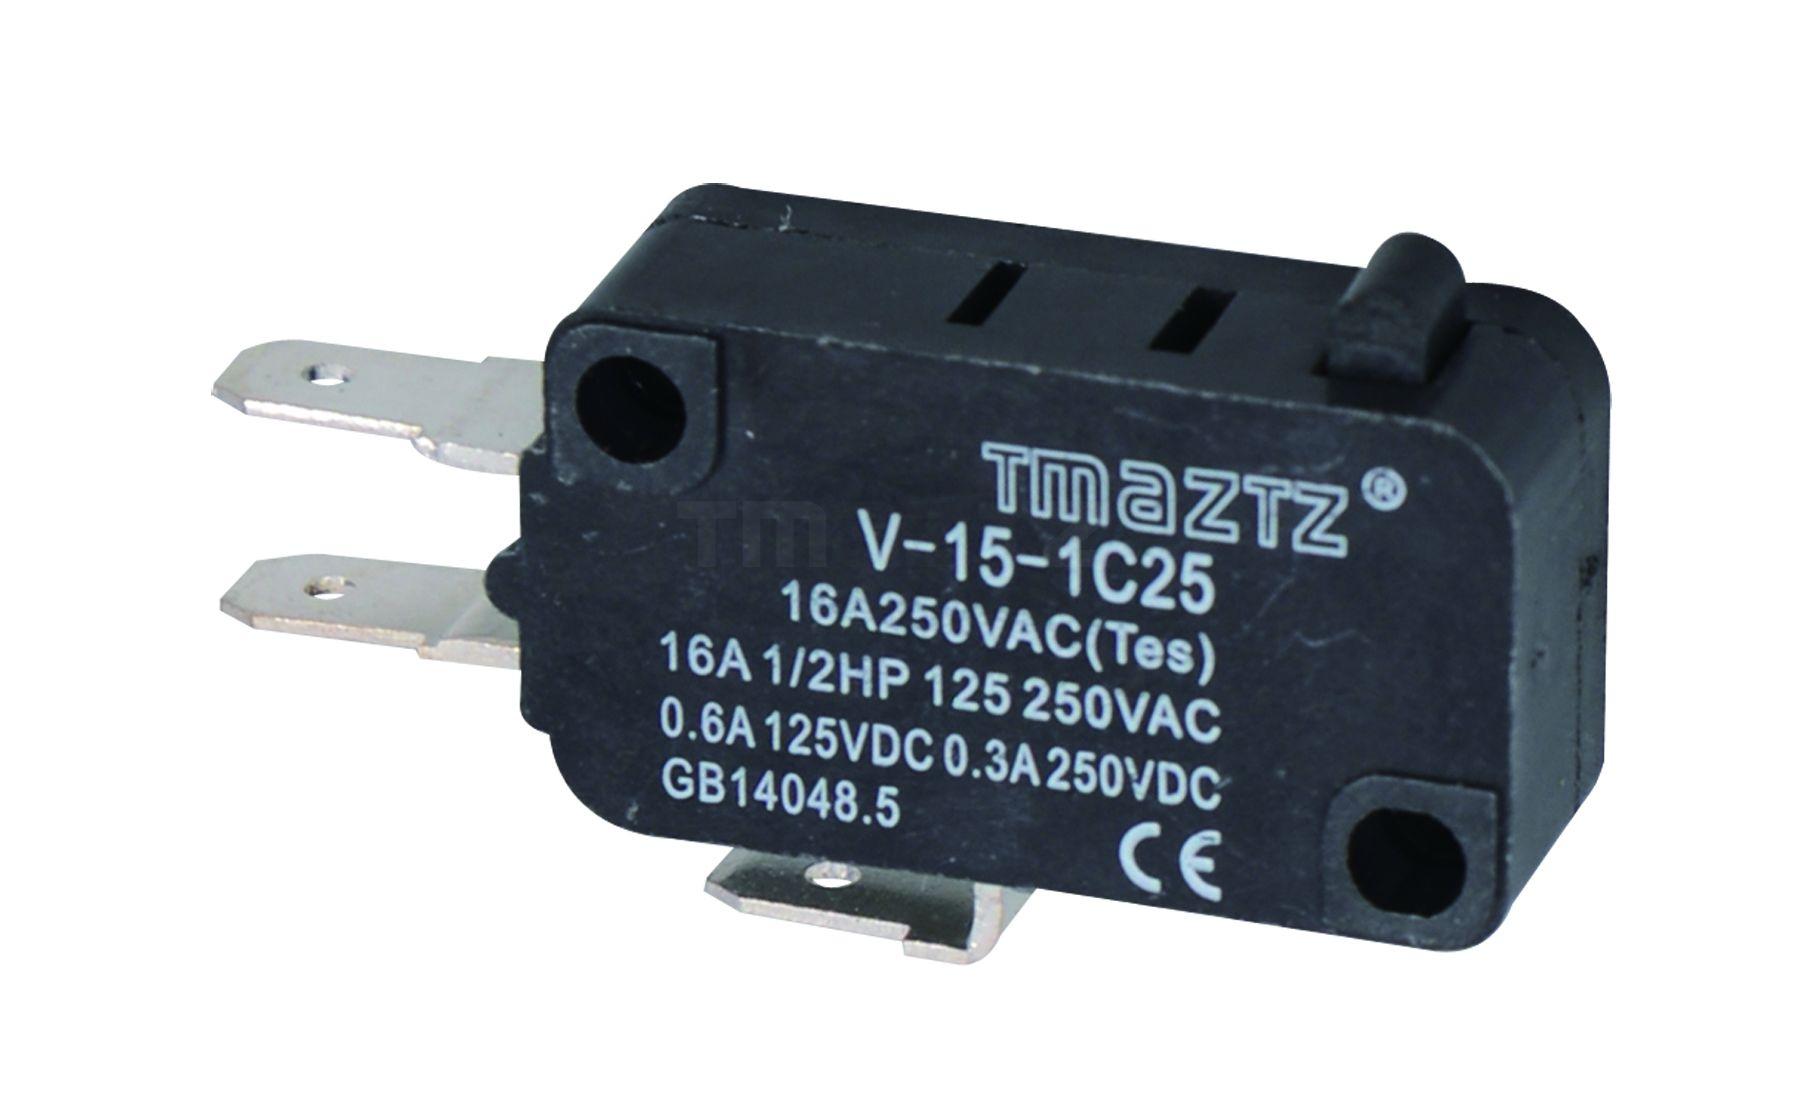 TFS-101 102 105 Foot Switch